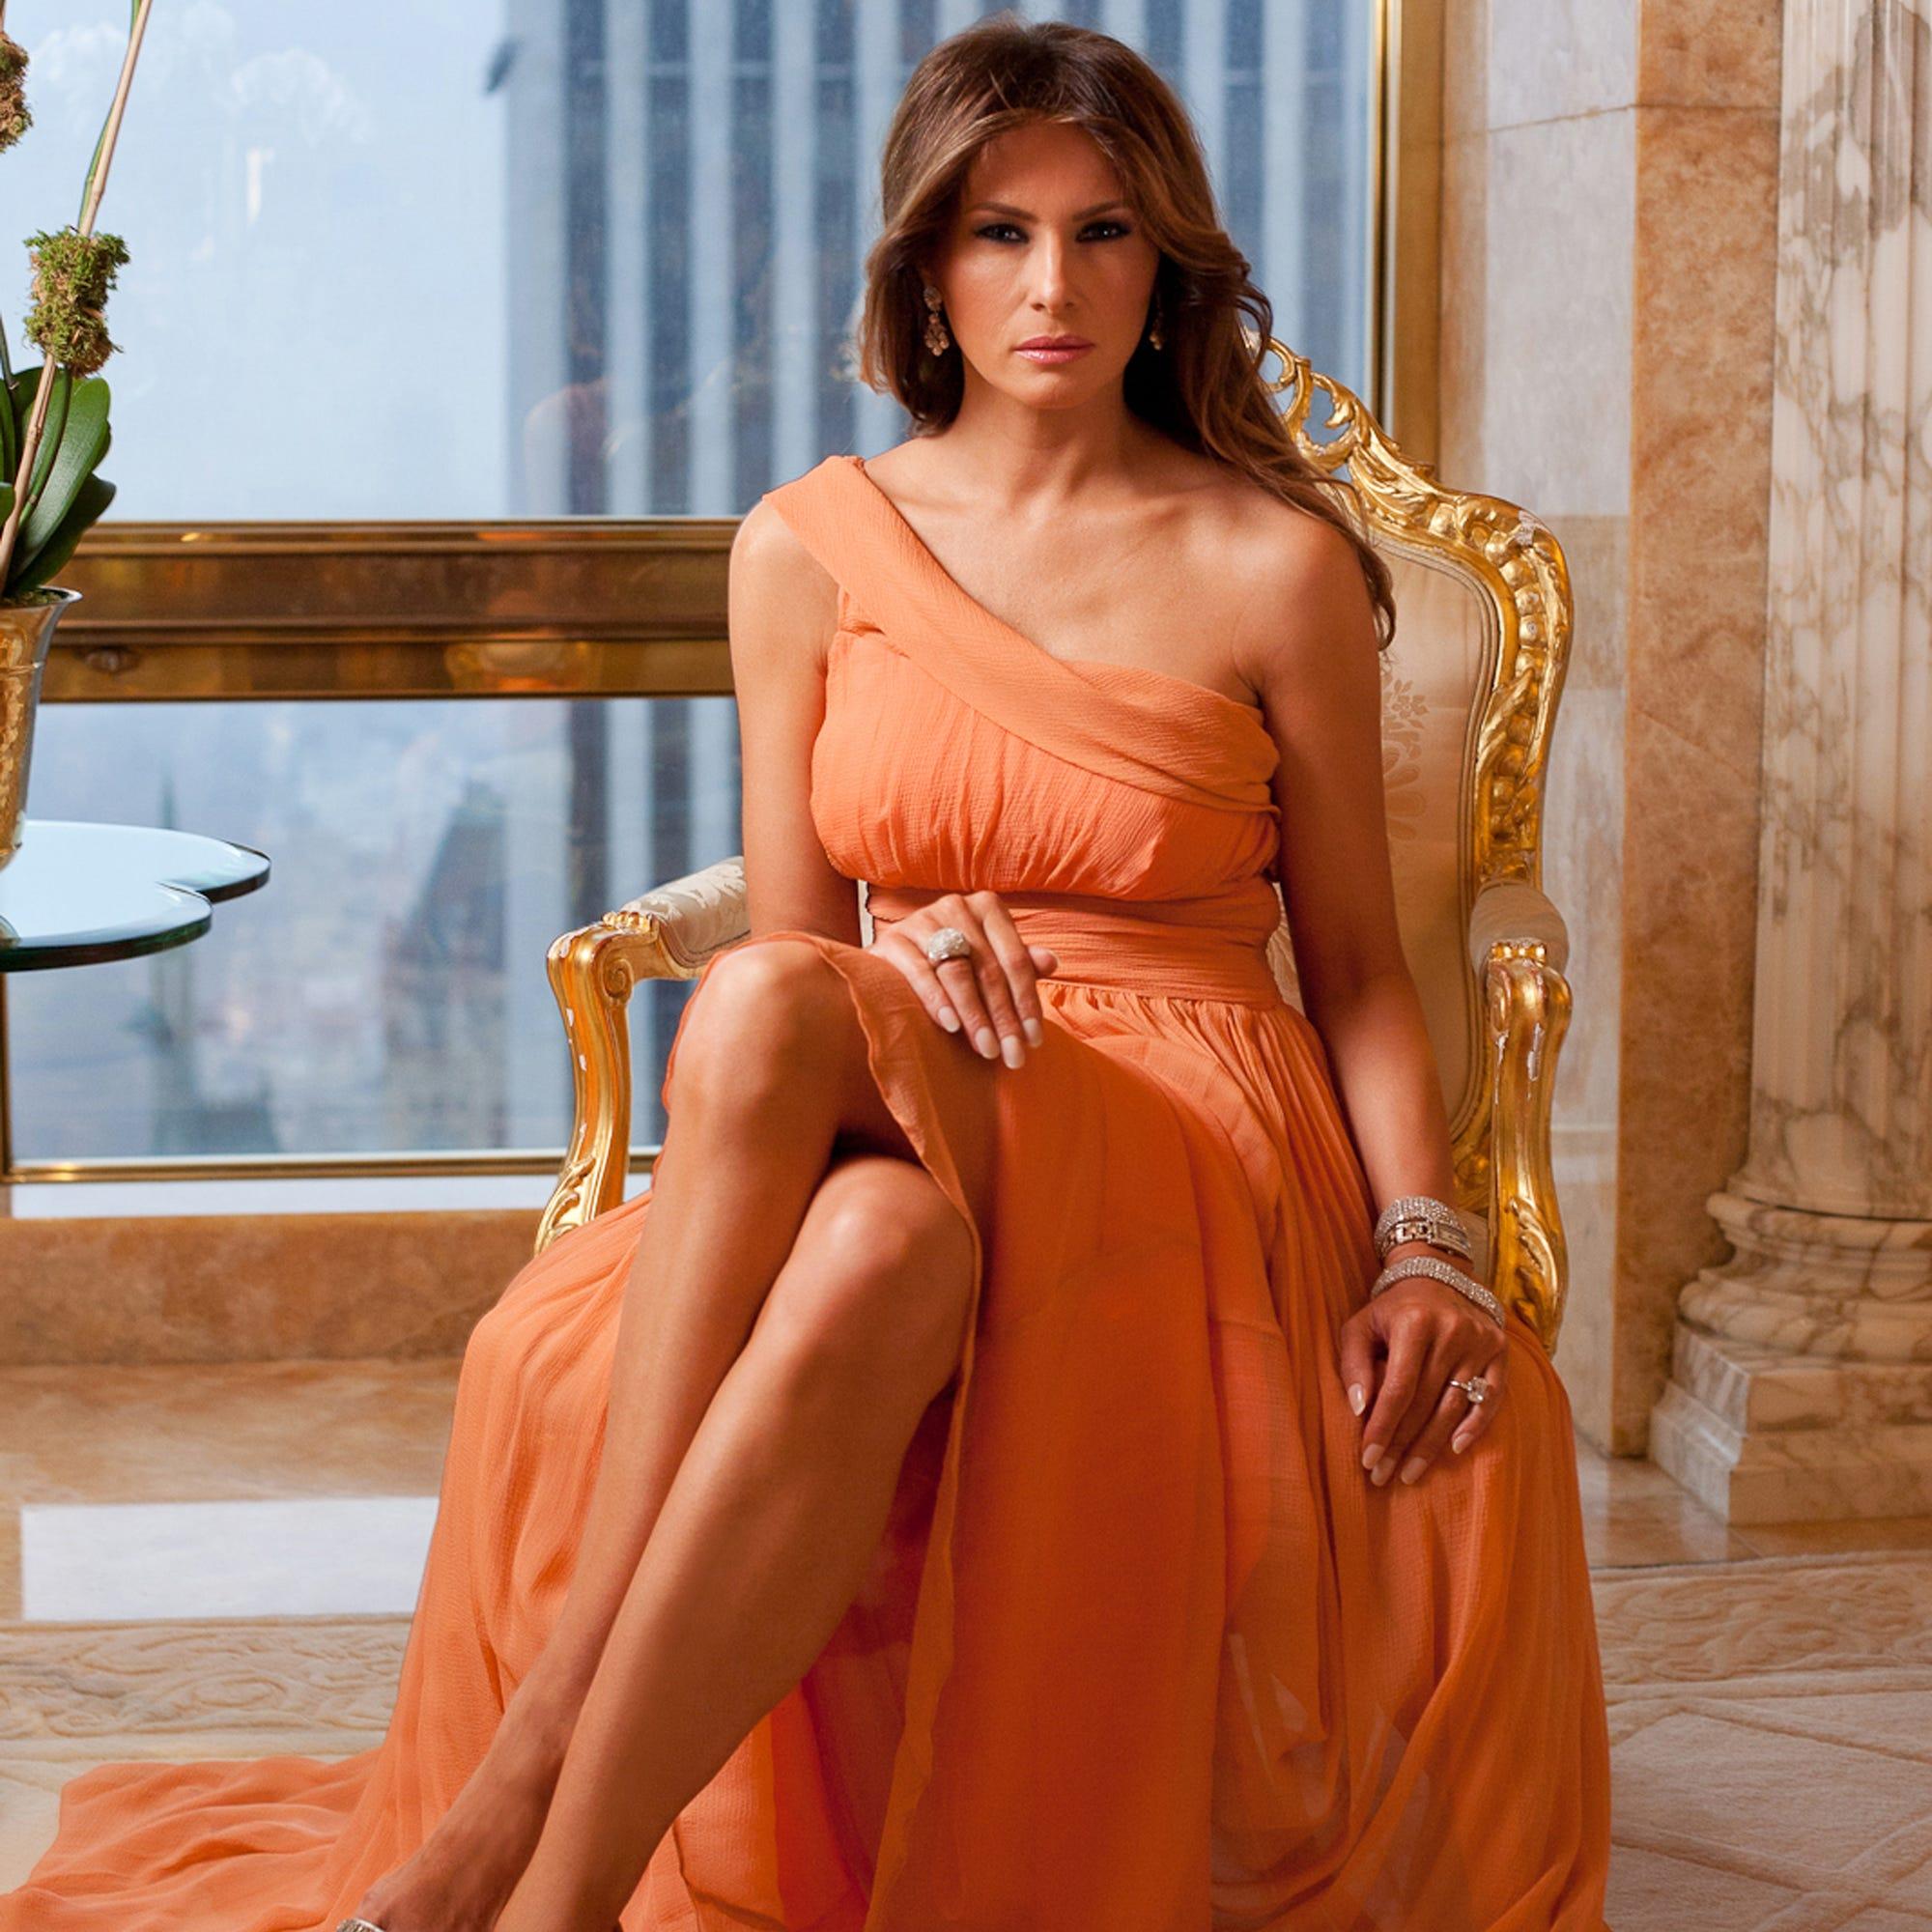 donald trump tower home tour melania trump interview - Melania Trump Wedding Ring